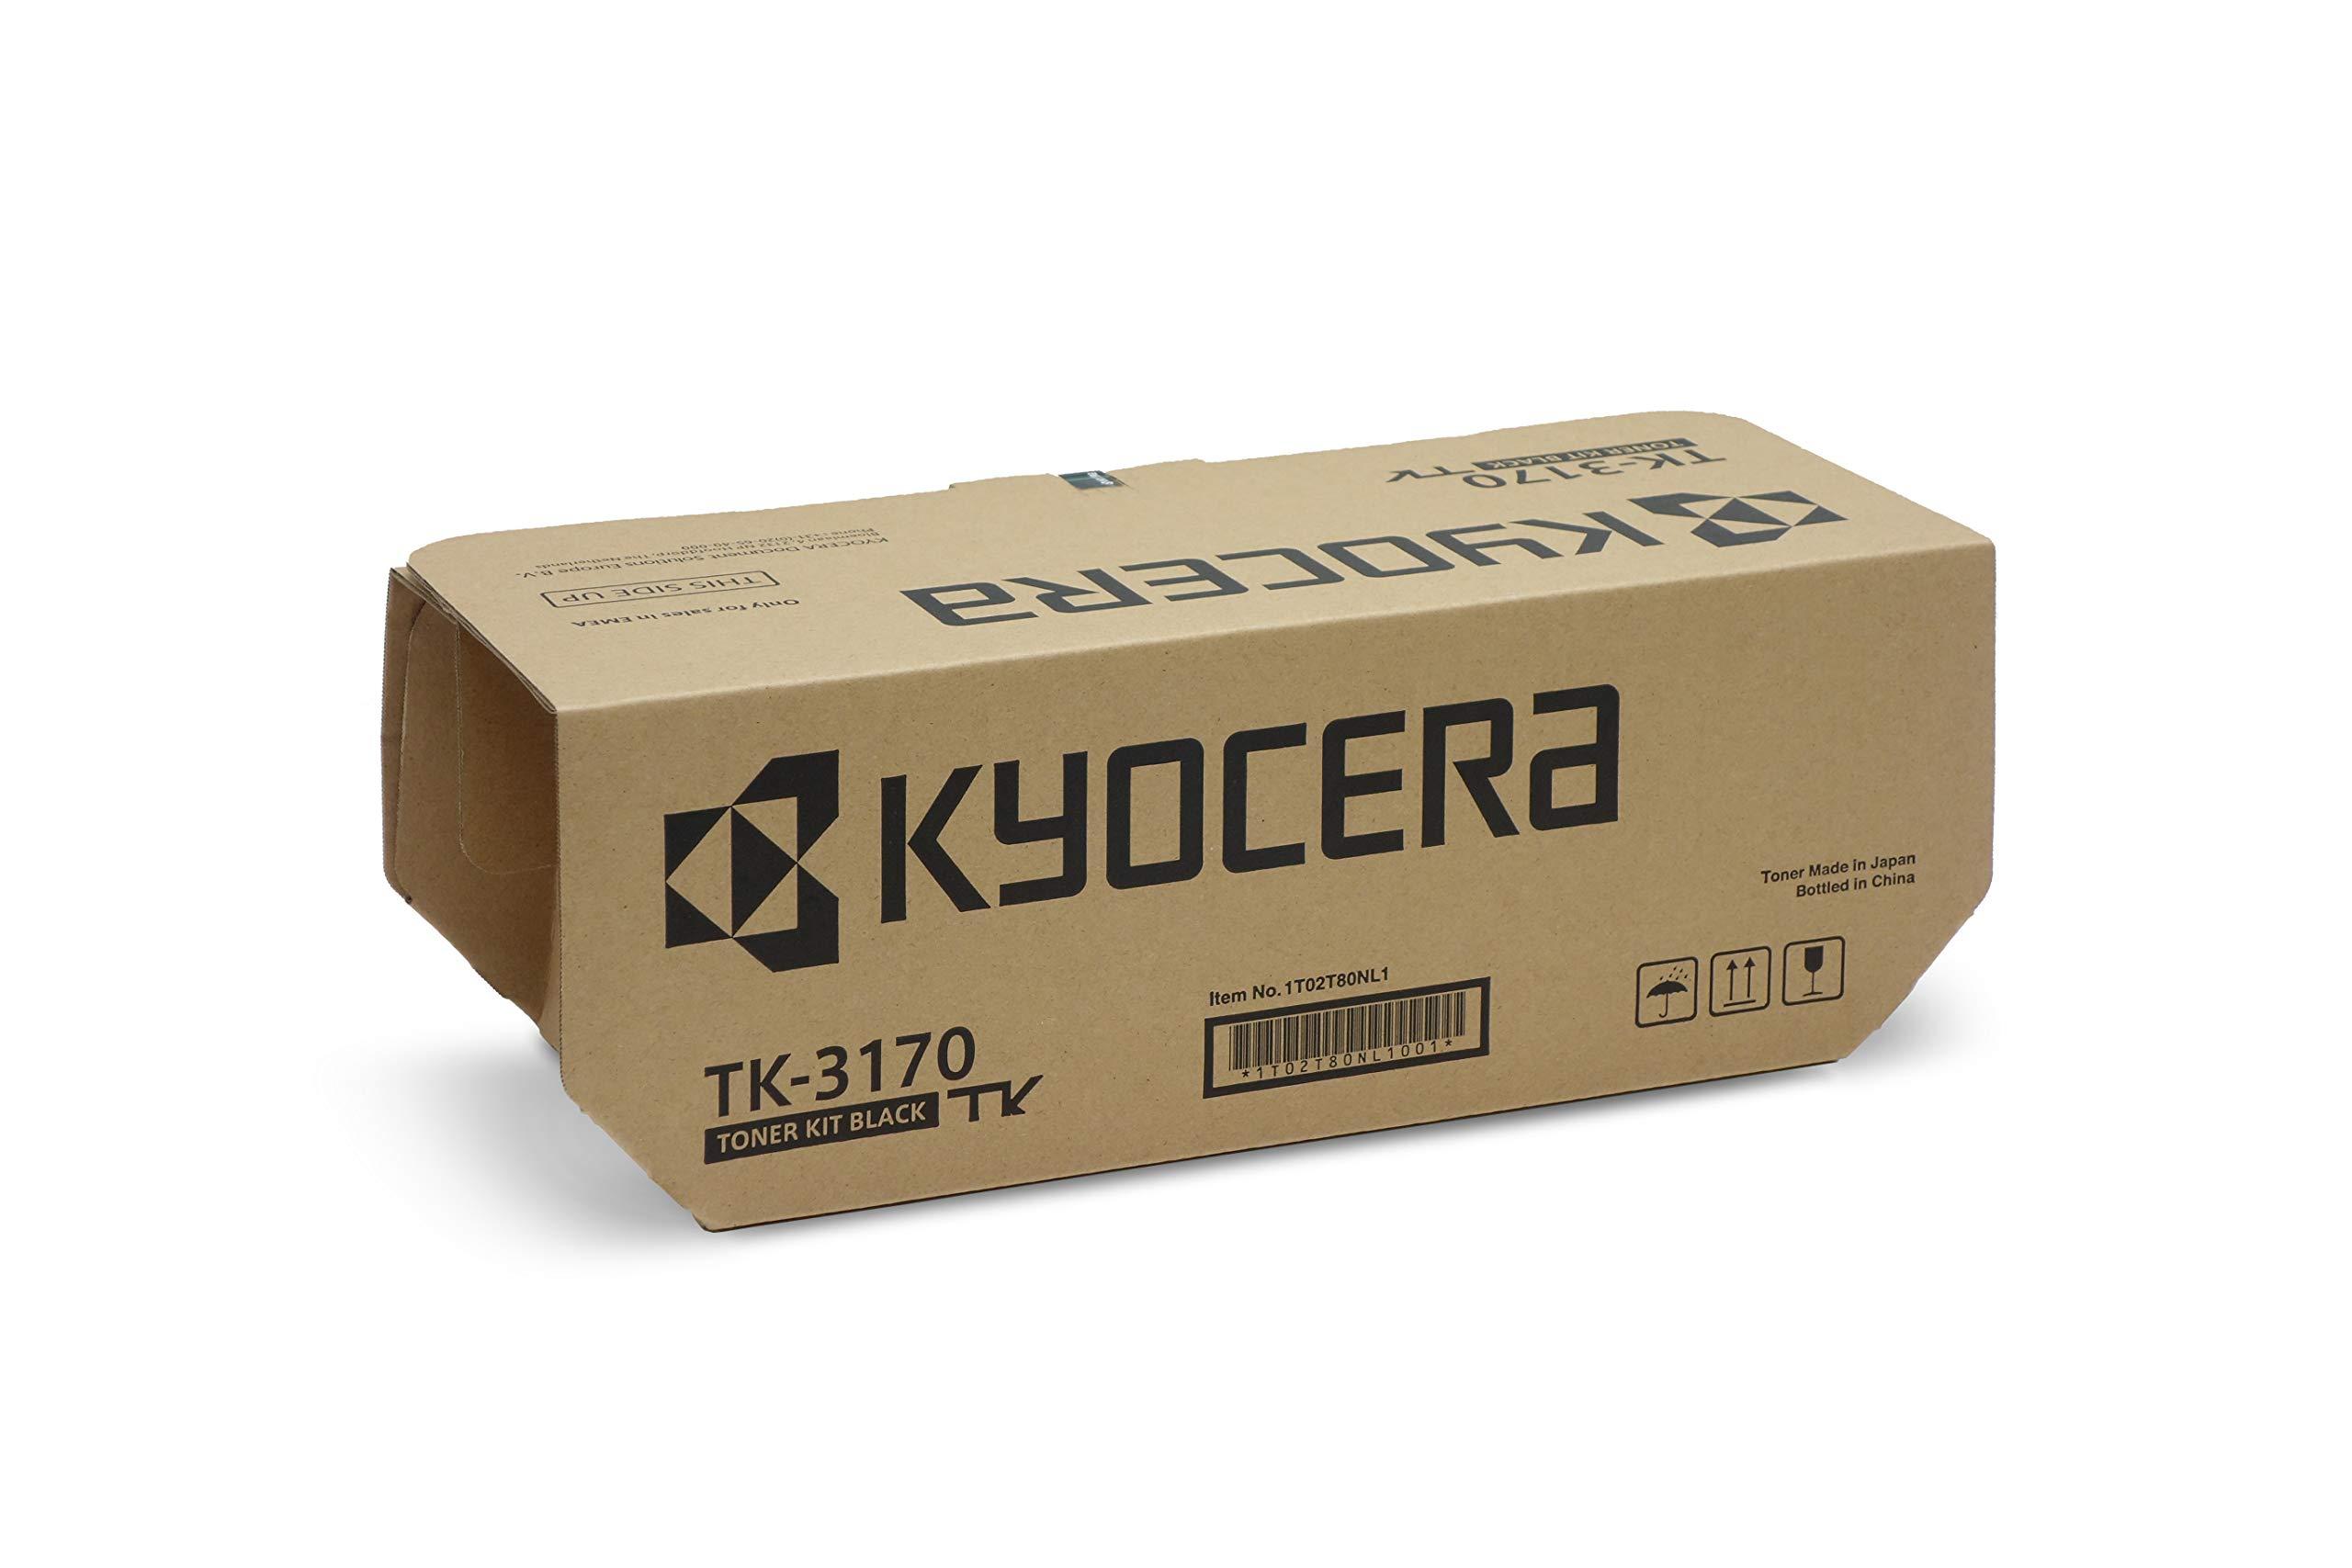 Kyocera-TK-3170-Schwarz-inkl-Resttonerbehlter-Original-Toner-Kartusche-1T02T80NL1-Kompatibel-fr-ECOSYS-P3050dn-ECOSYS-P3055dn-ECOSYS-P3060dn